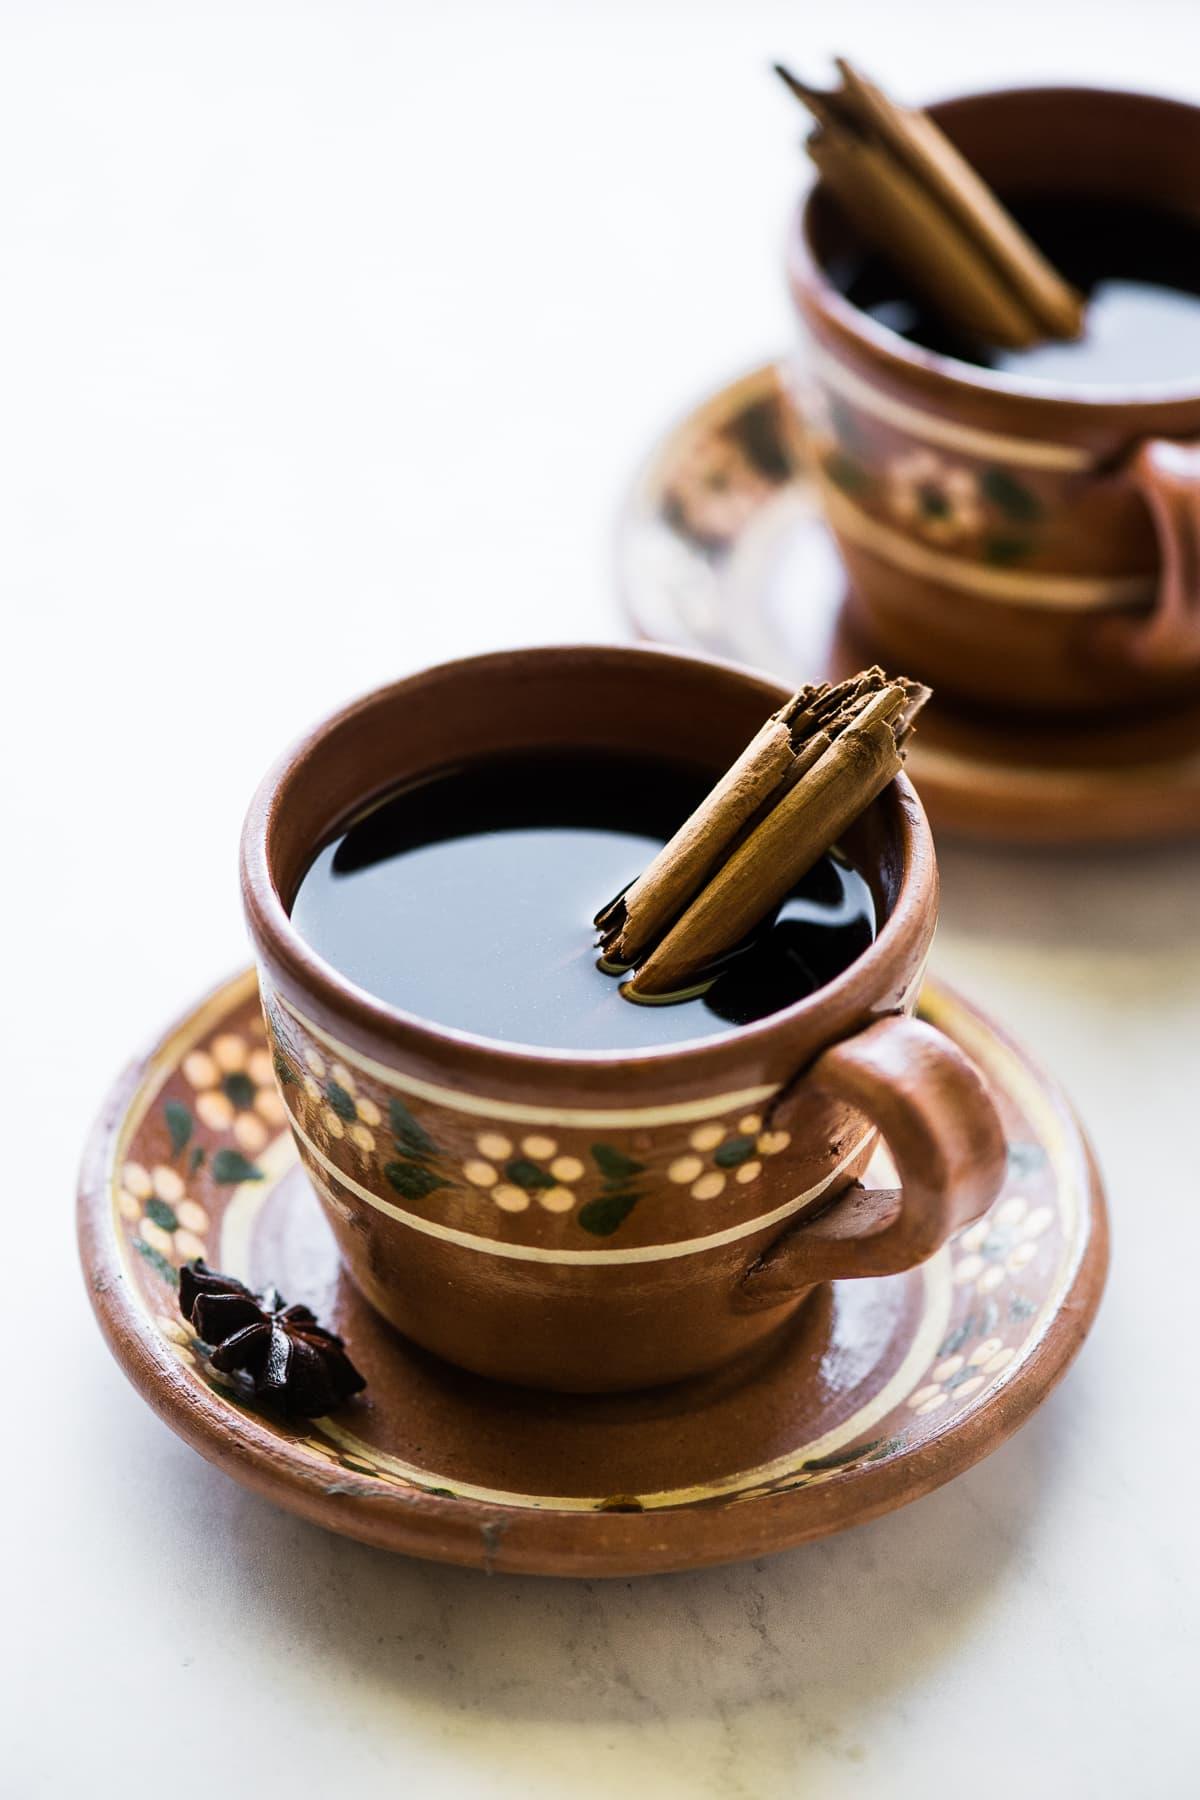 A mug full of cafe de olla or Mexican coffee